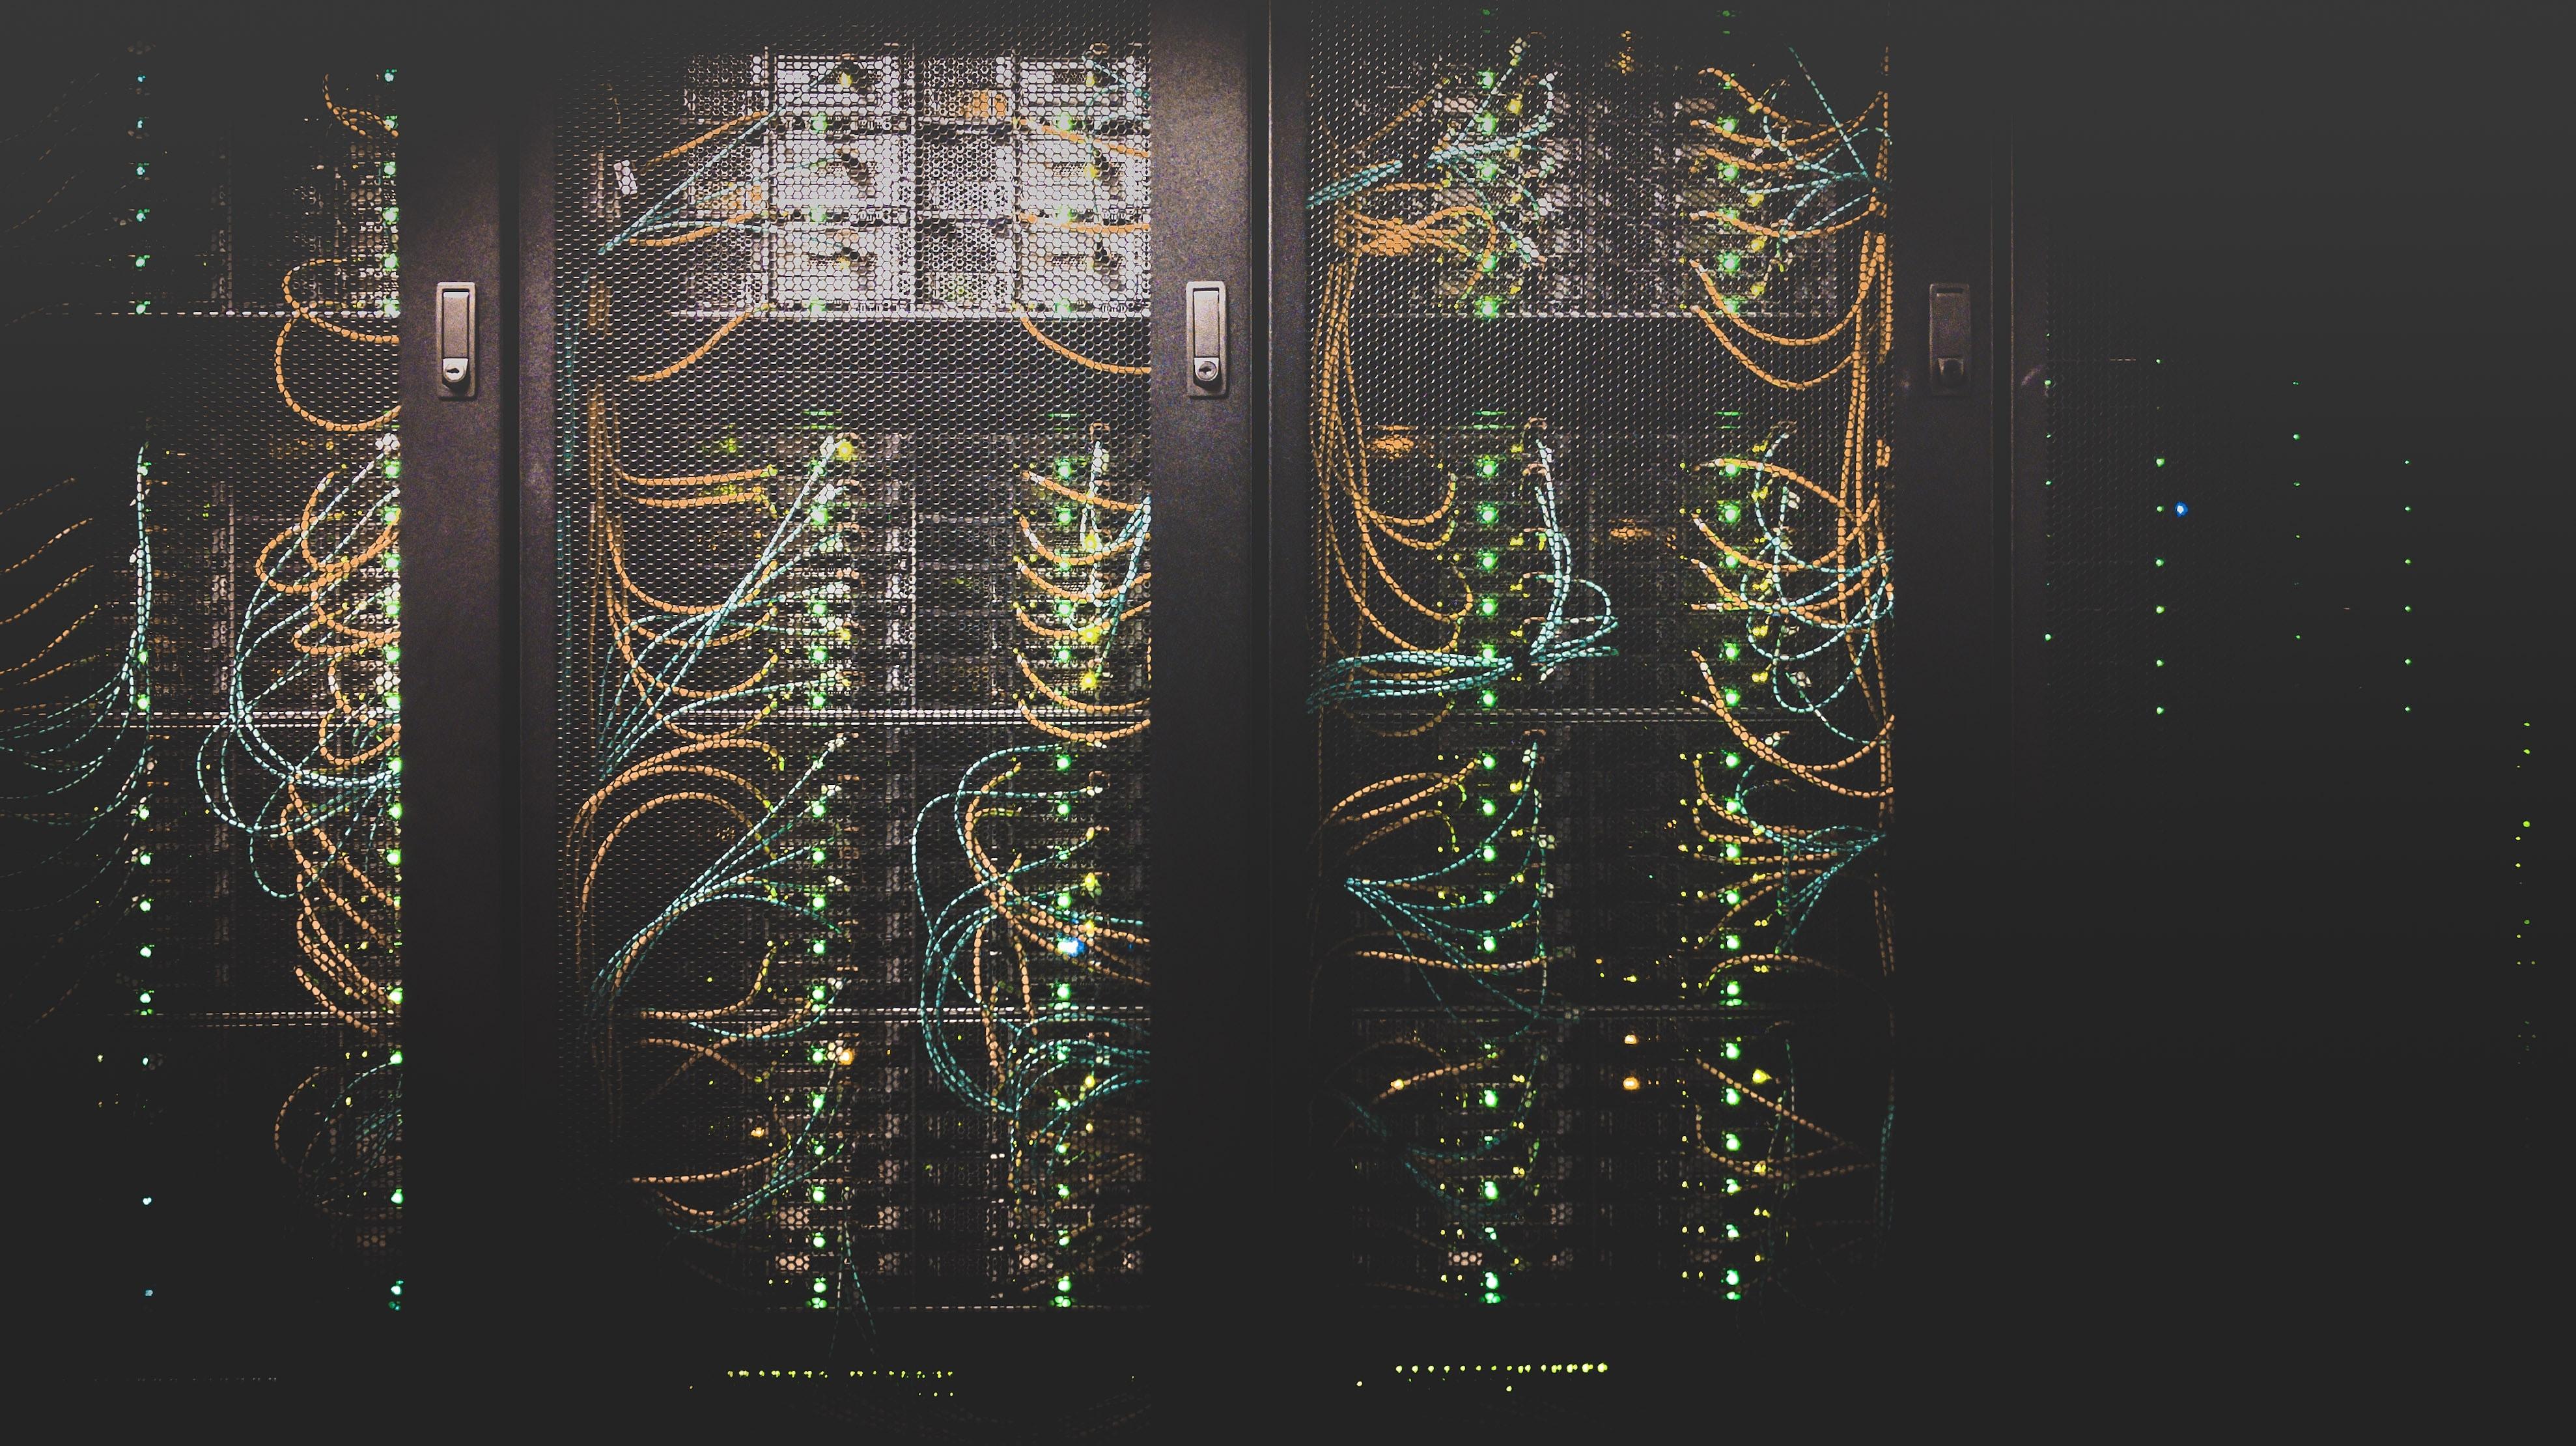 Basic Networking in Docker